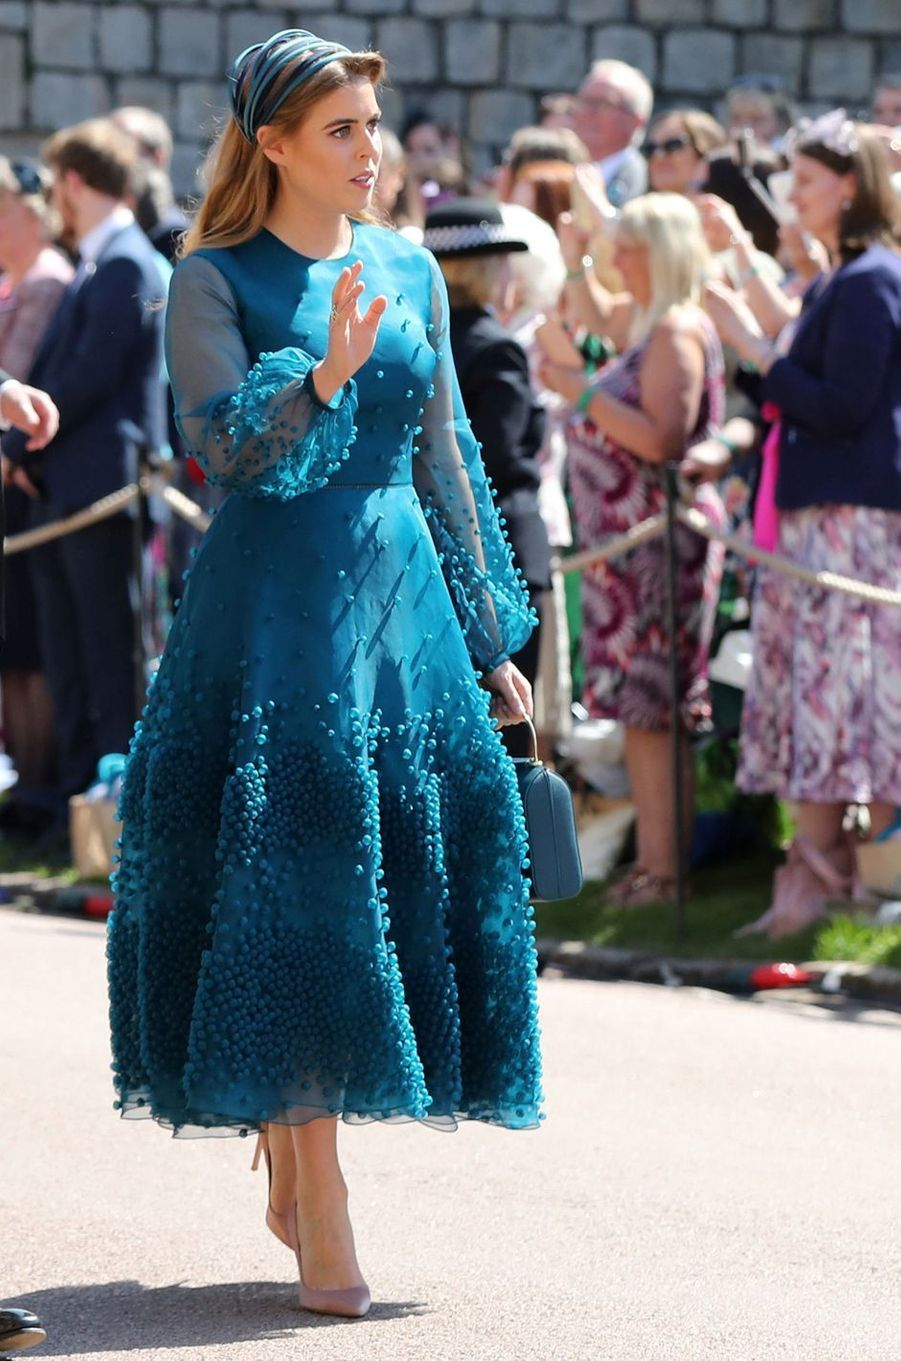 La princesse Beatrice d'York en Roksanda, le 19 mai 2018